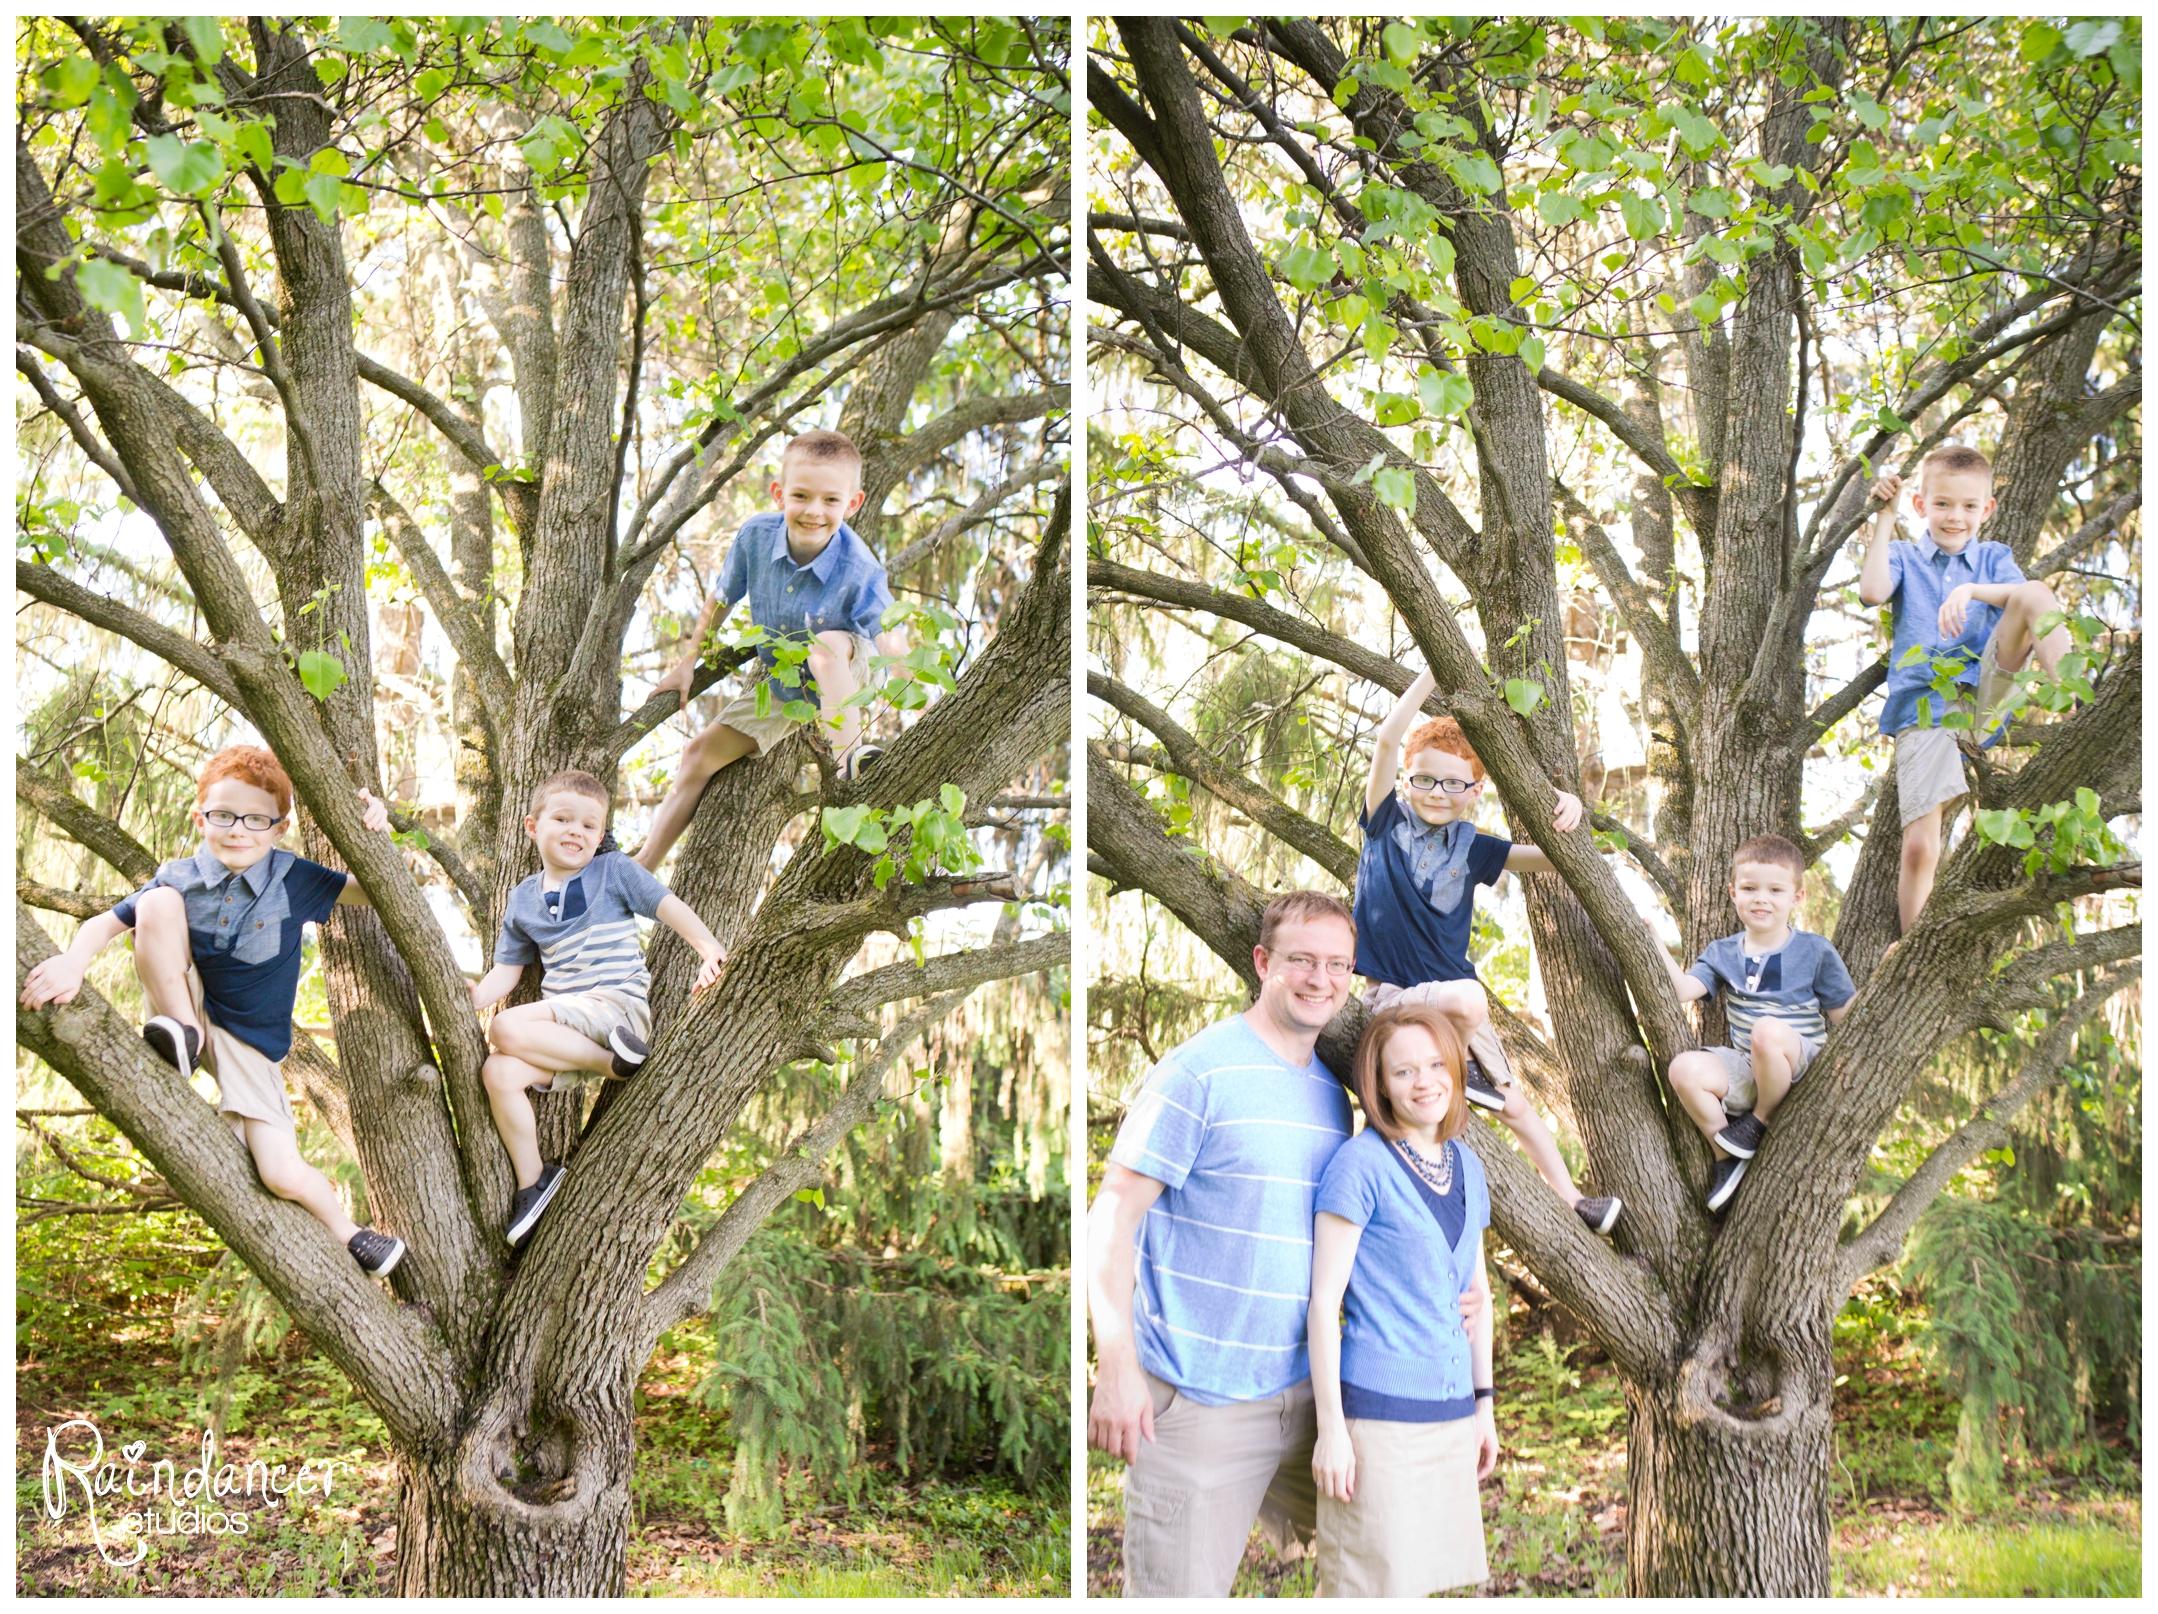 Indianapolis Family Photographer, Indianapolis children photographer, Indianapolis family photography